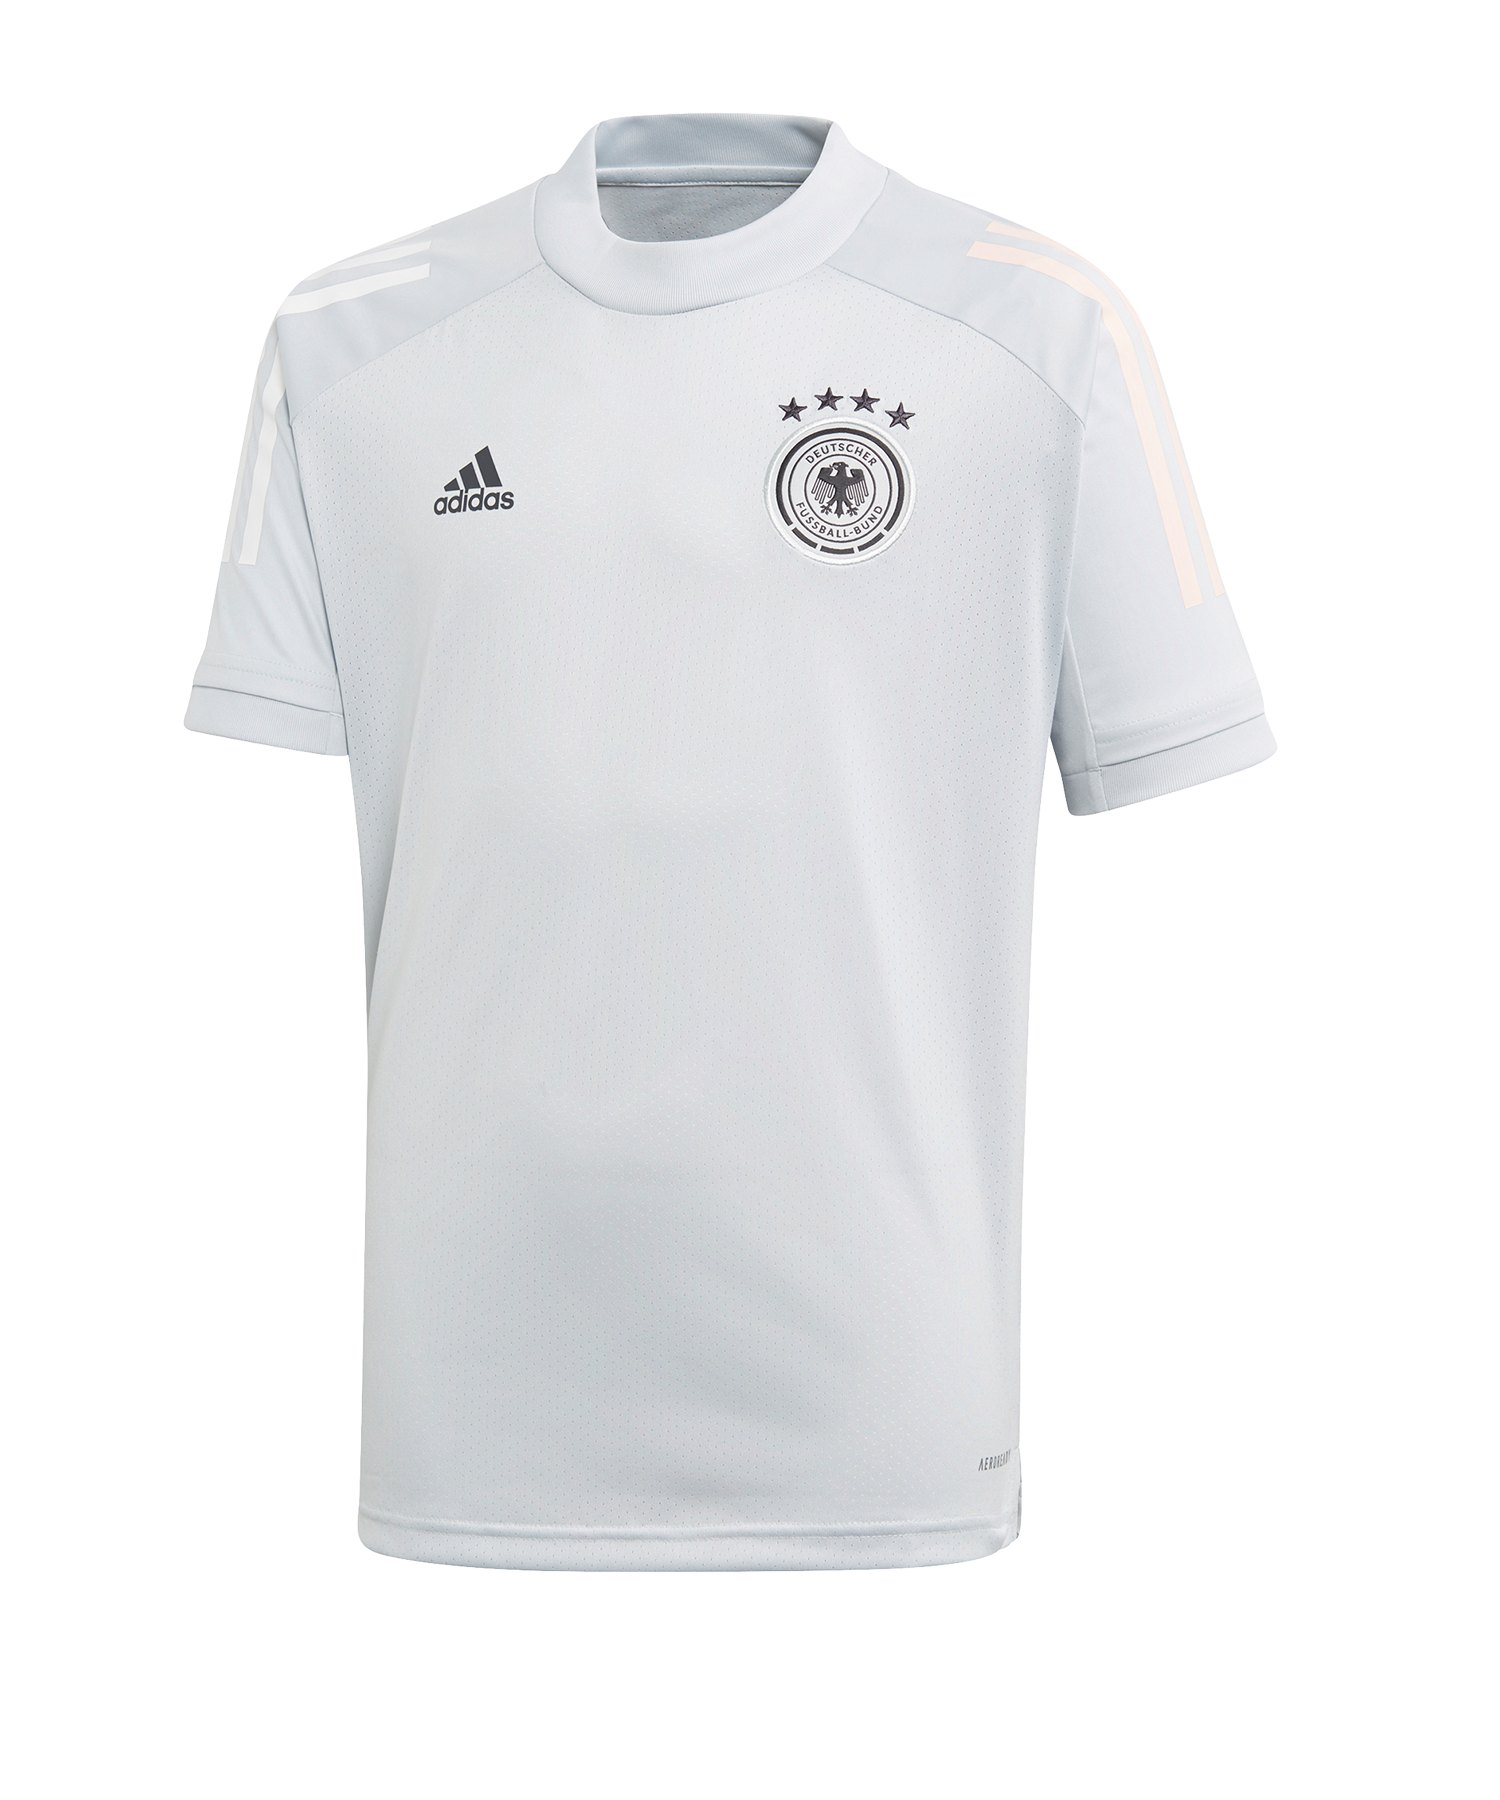 adidas DFB Deutschland Trainingsshirt Kids Hellgrau - weiss